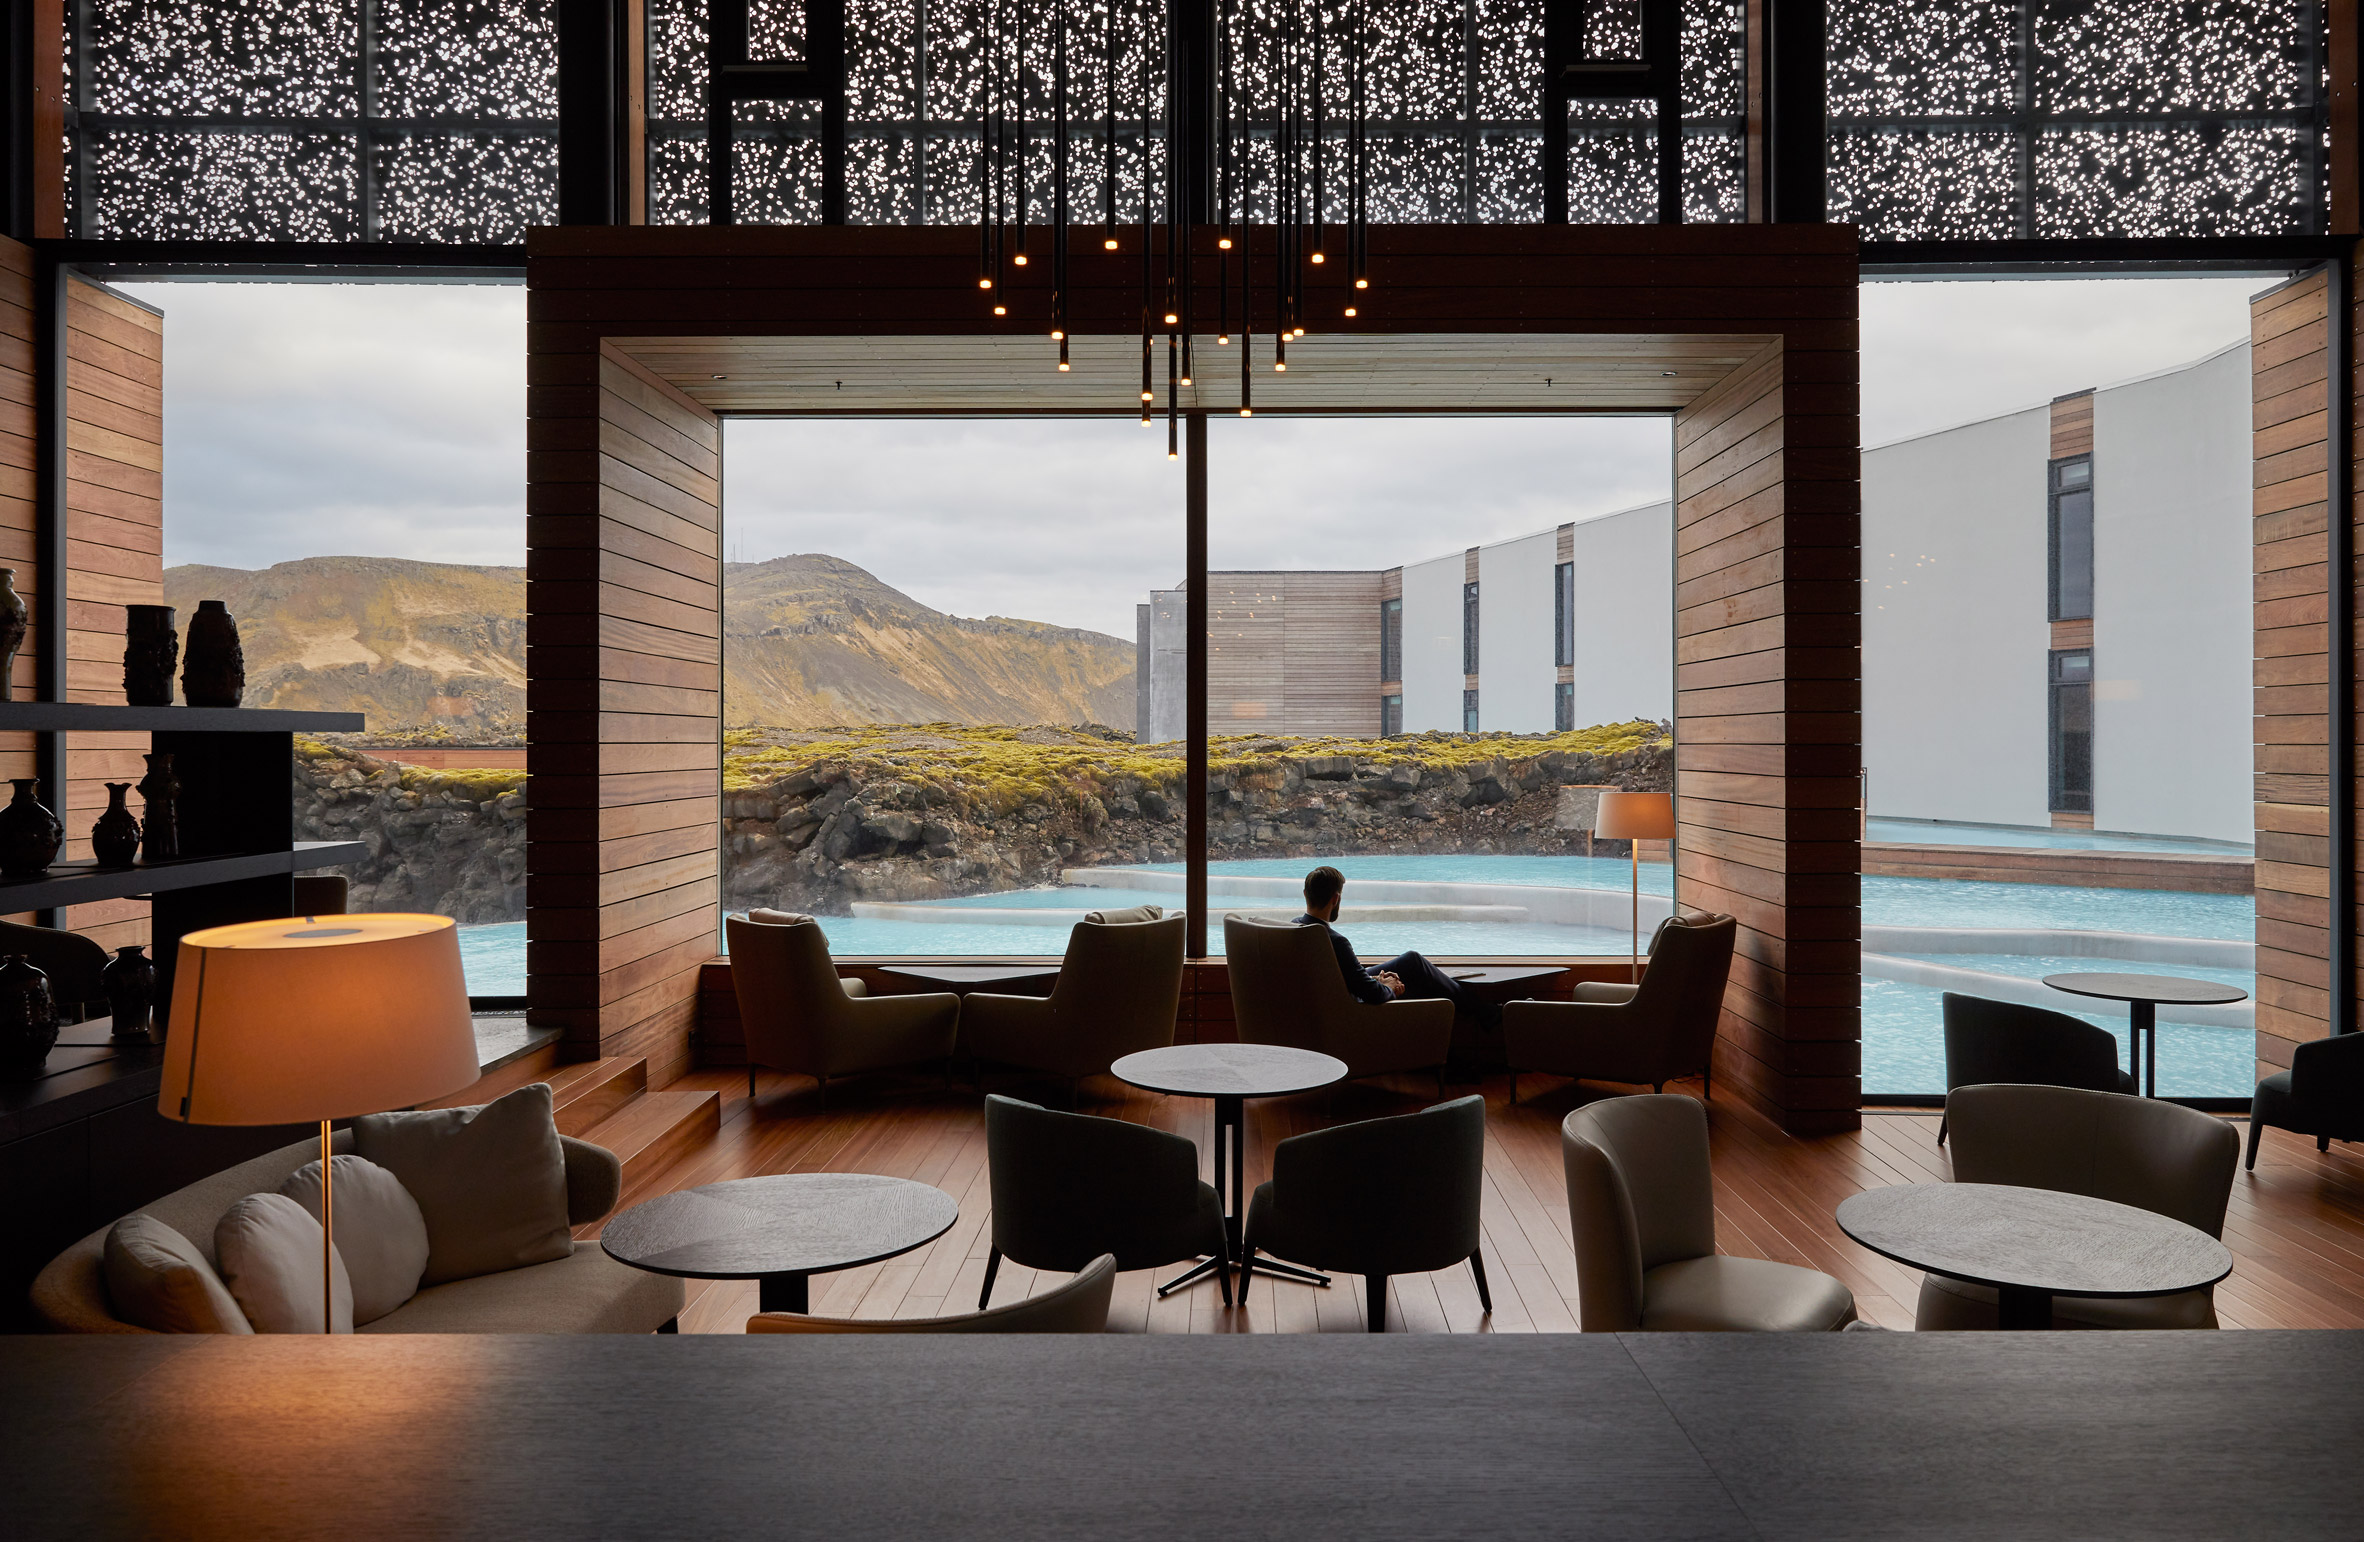 Thiết kế nội thất Resort 5